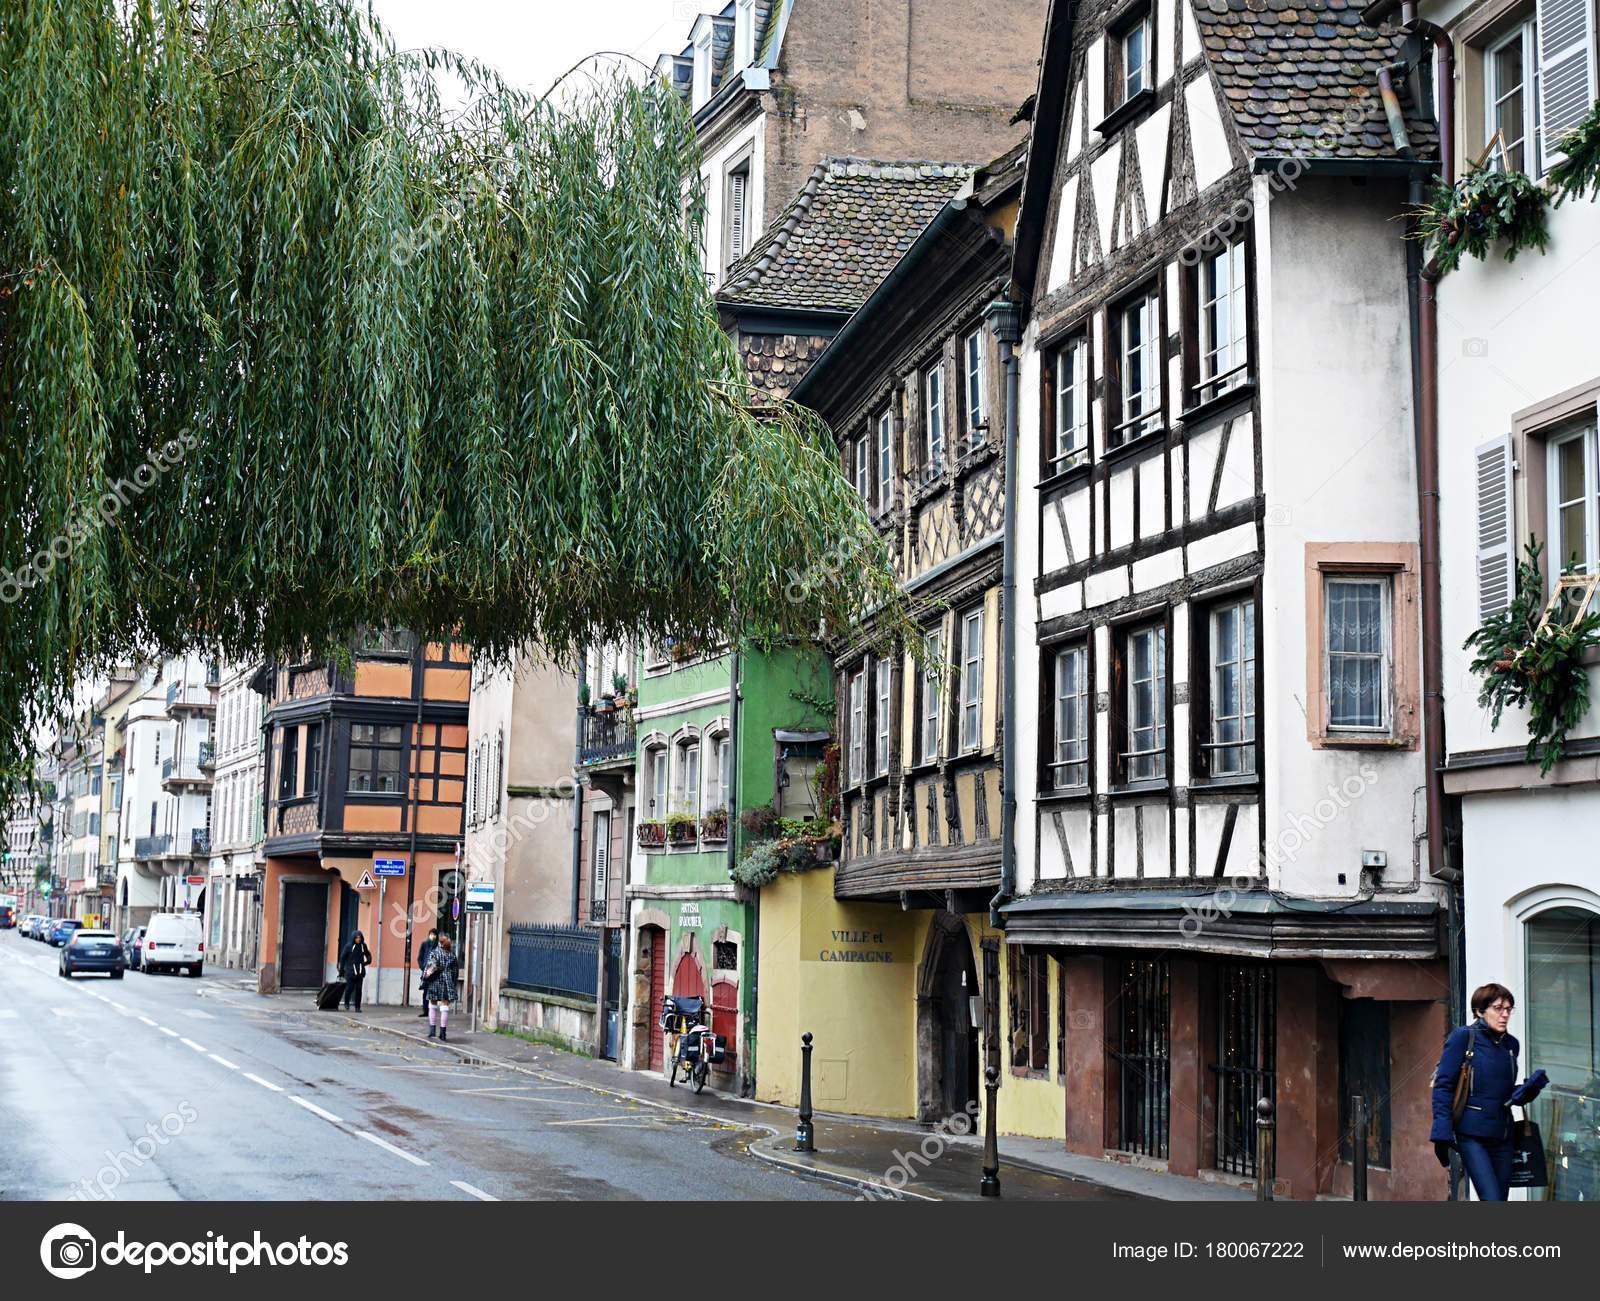 Case Piccole Ma Belle : Bella città bella mostra strasburgo francia belle case piccole case